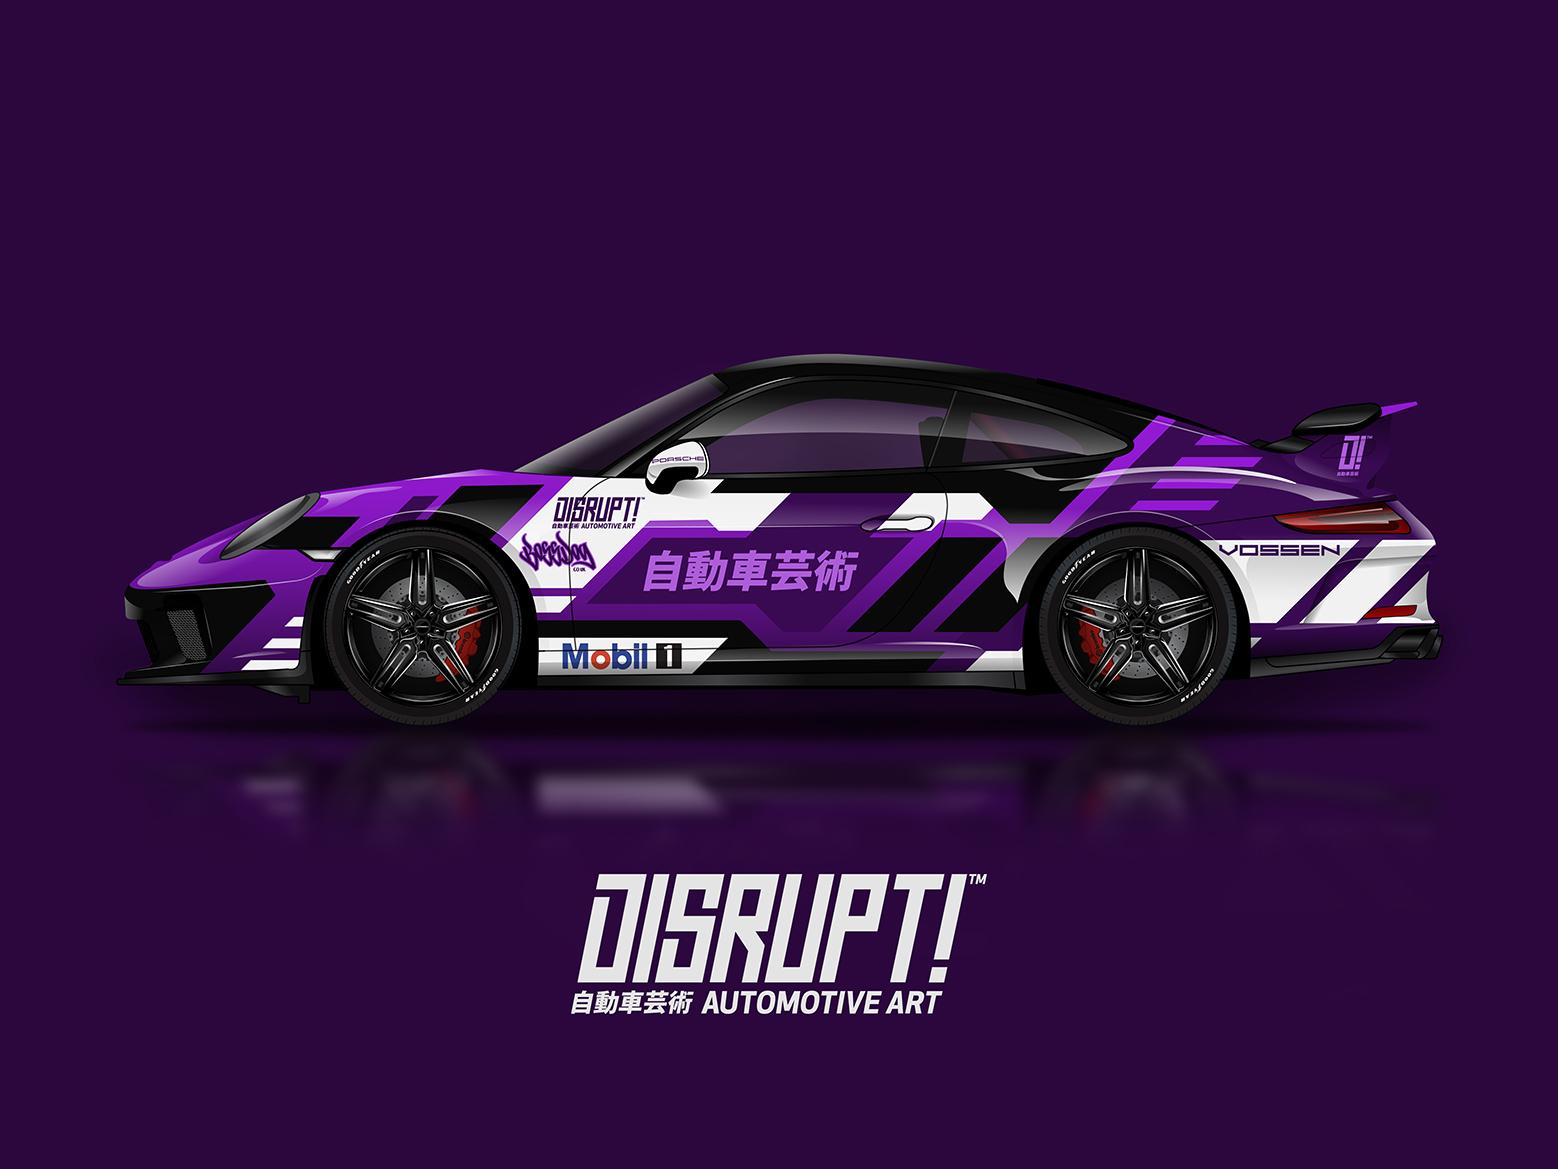 Porsche 911 Gt3 Vehicle Wrap Design 911 vinyl race vector porsche illustration design wrap car